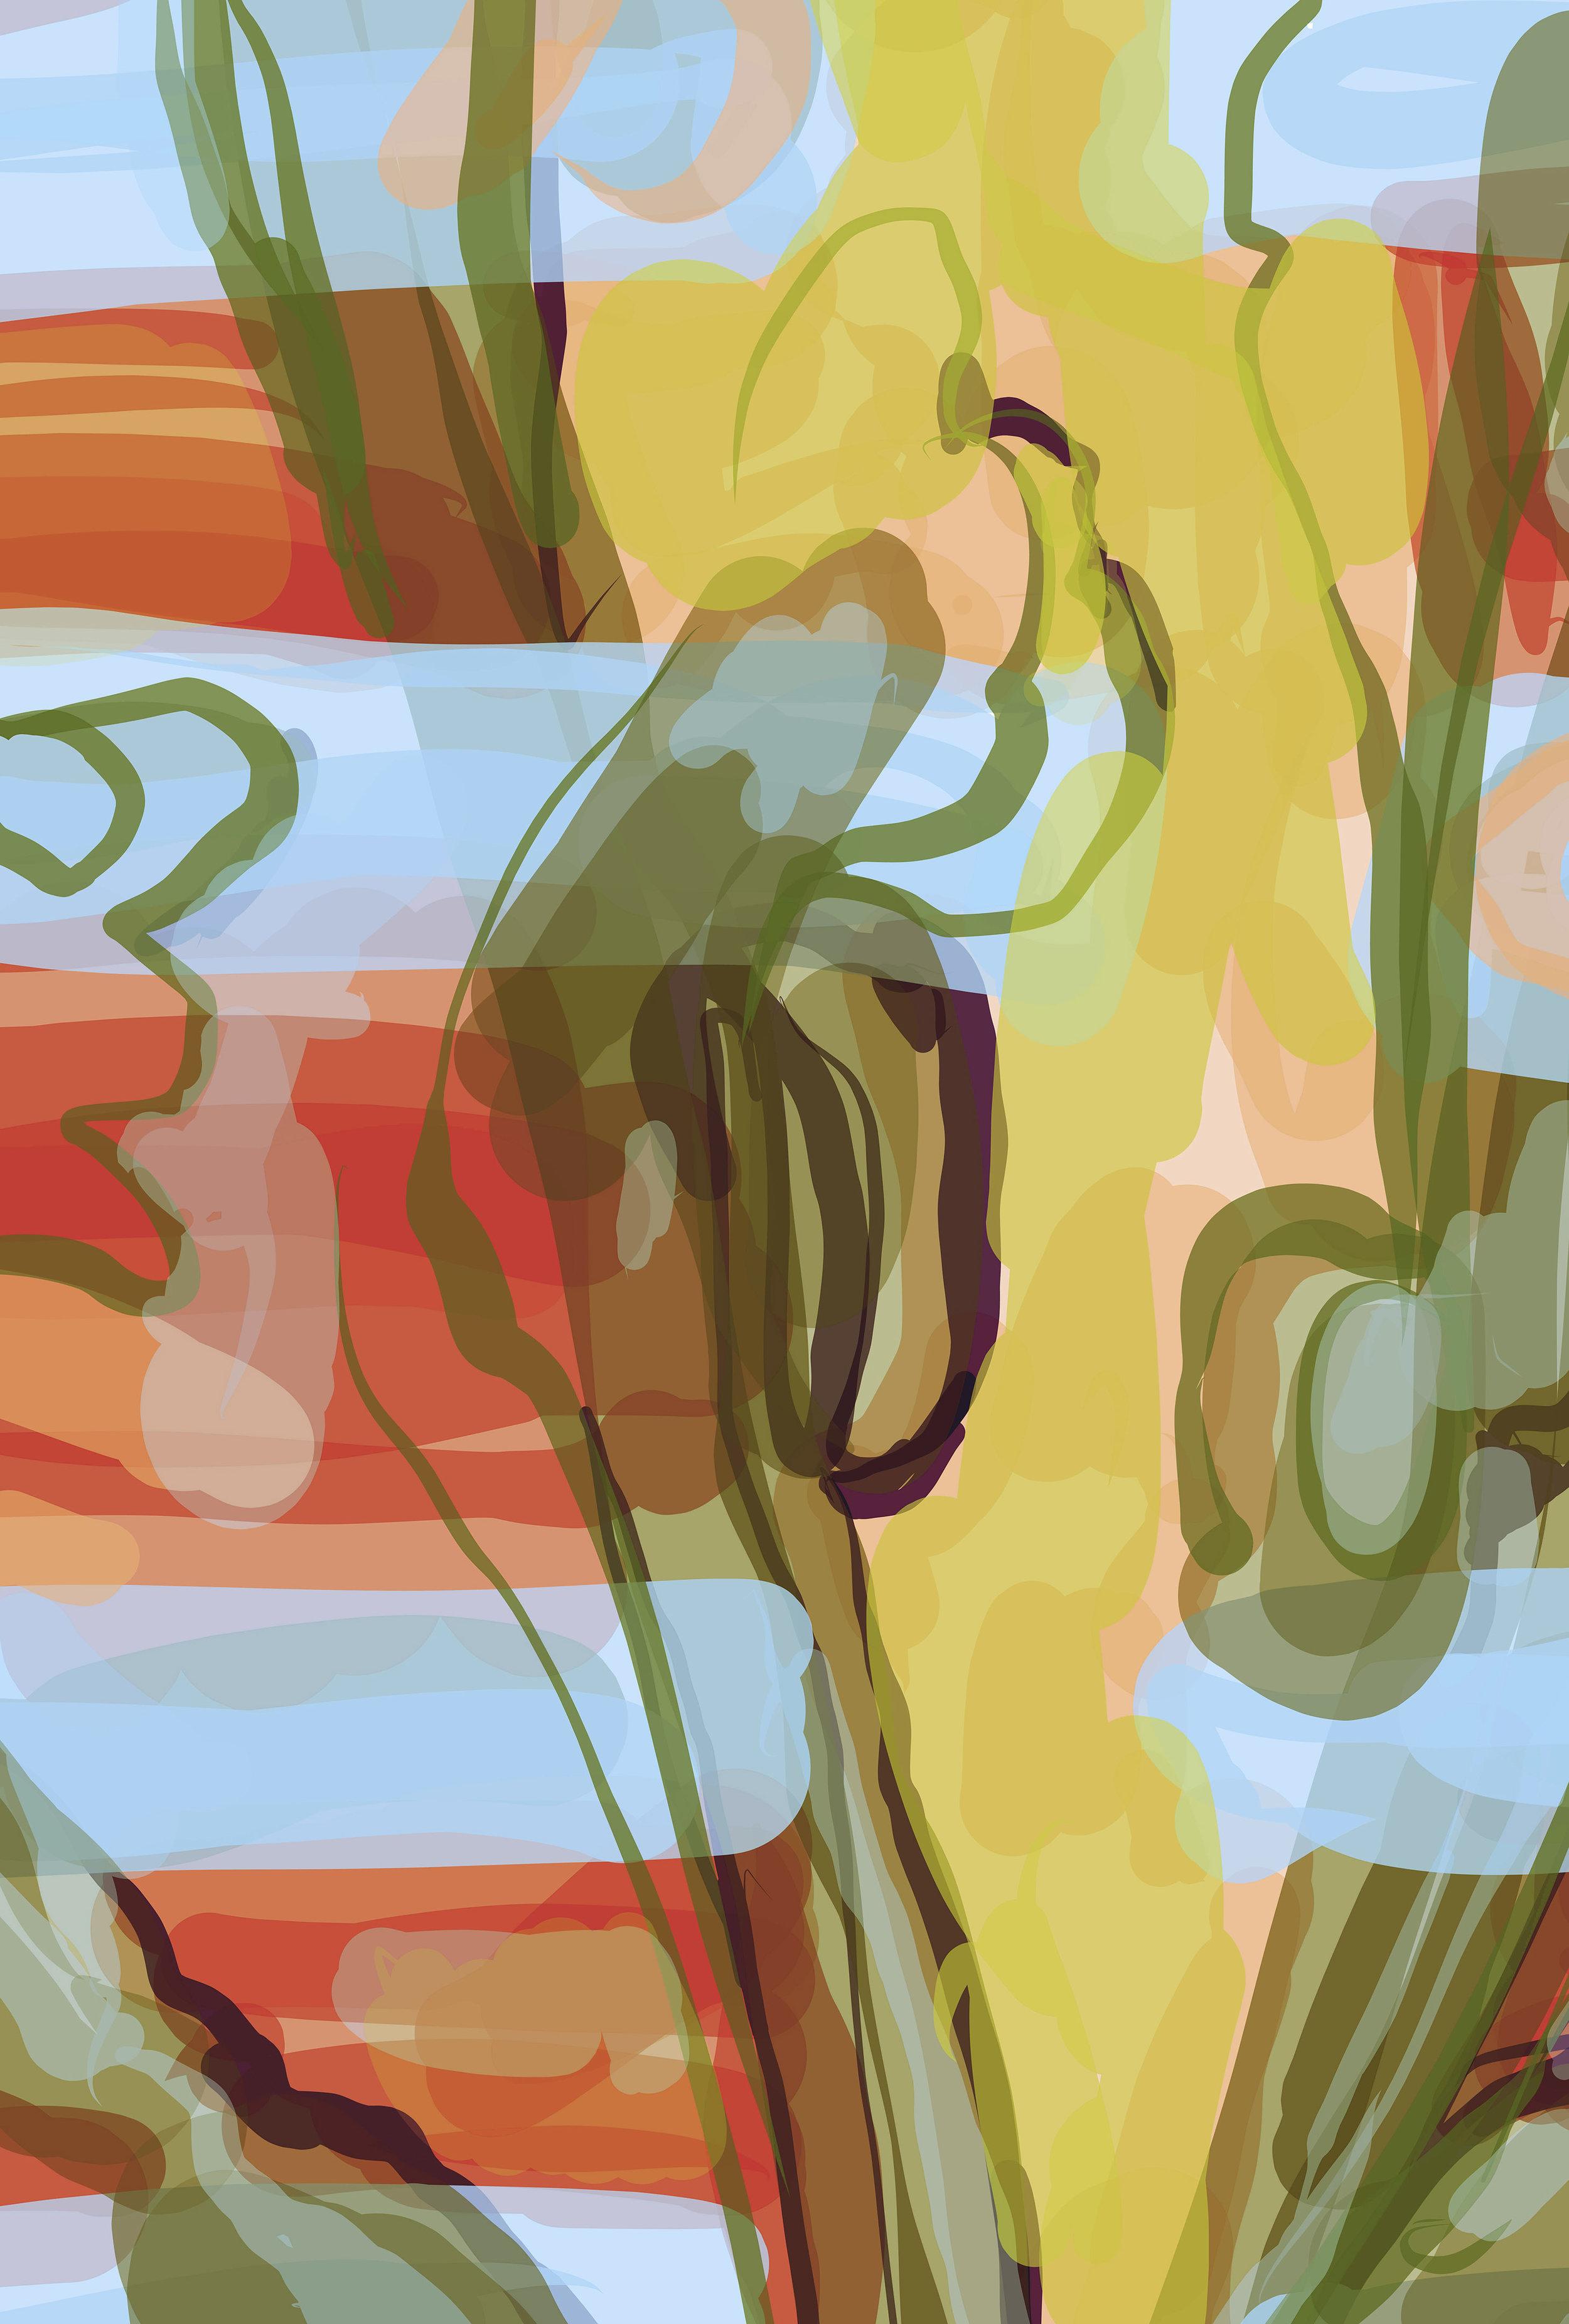 11may19 ipad image1 abstract_stream-v1clr1shft4ful1clr2fulcrp2lrgmed.jpg